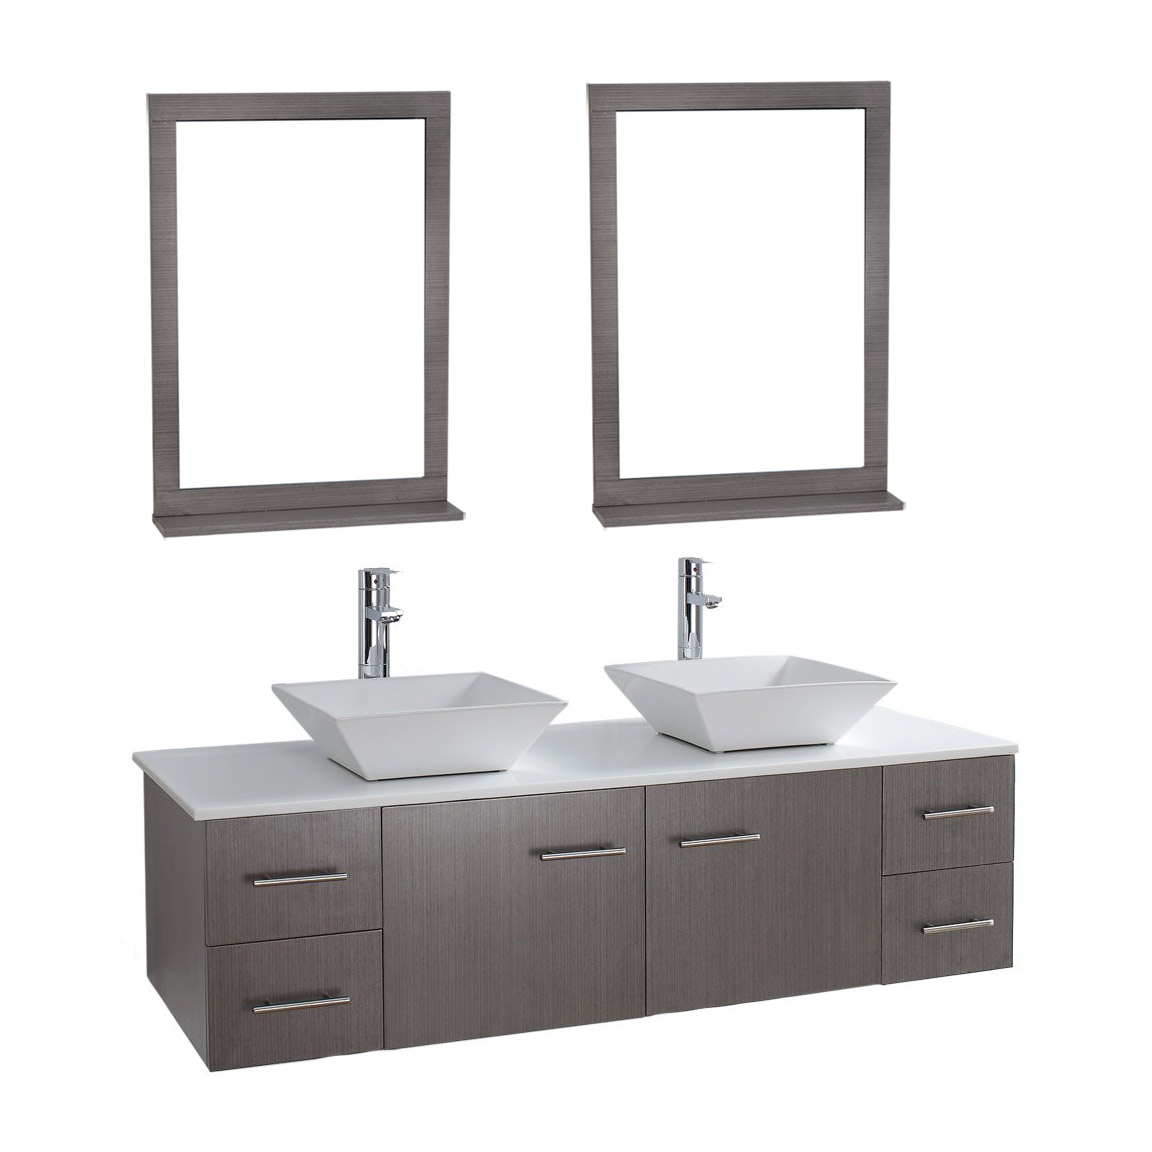 Siena Solid Wood 71 Wall Mounted Double Bathroom Vanity Mirror Set Vm Vaw1 72 Lgo